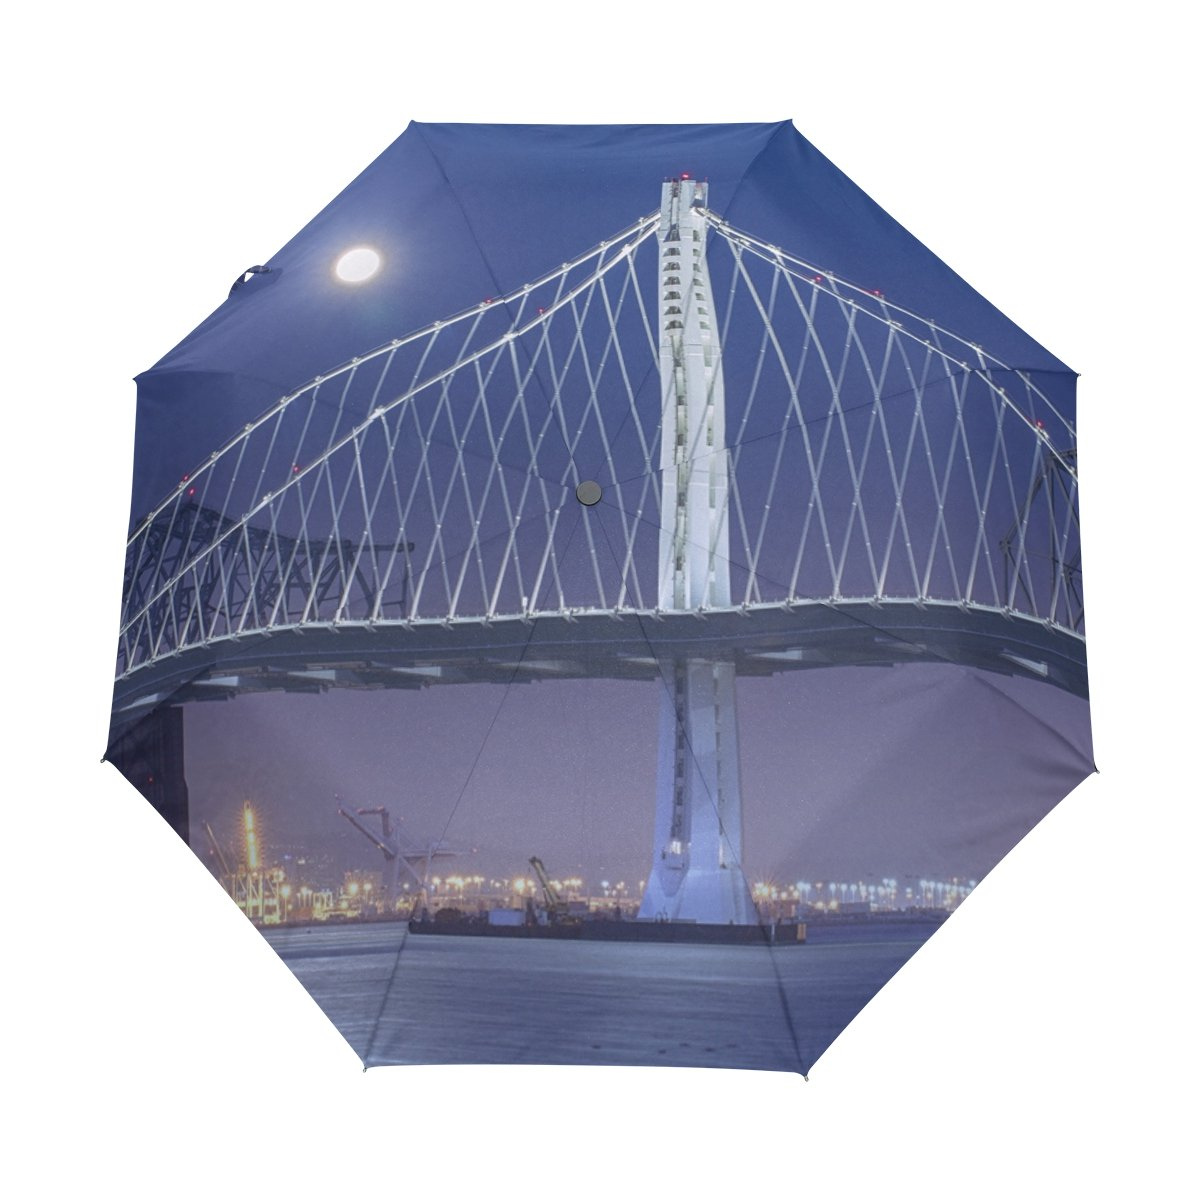 Senya Saobao防風と防雨トラベル傘with自動開いて閉じFolding Bay Bridge at Night with Full Moonポータブル折りたたみ式太陽雨傘 B07FF145WT